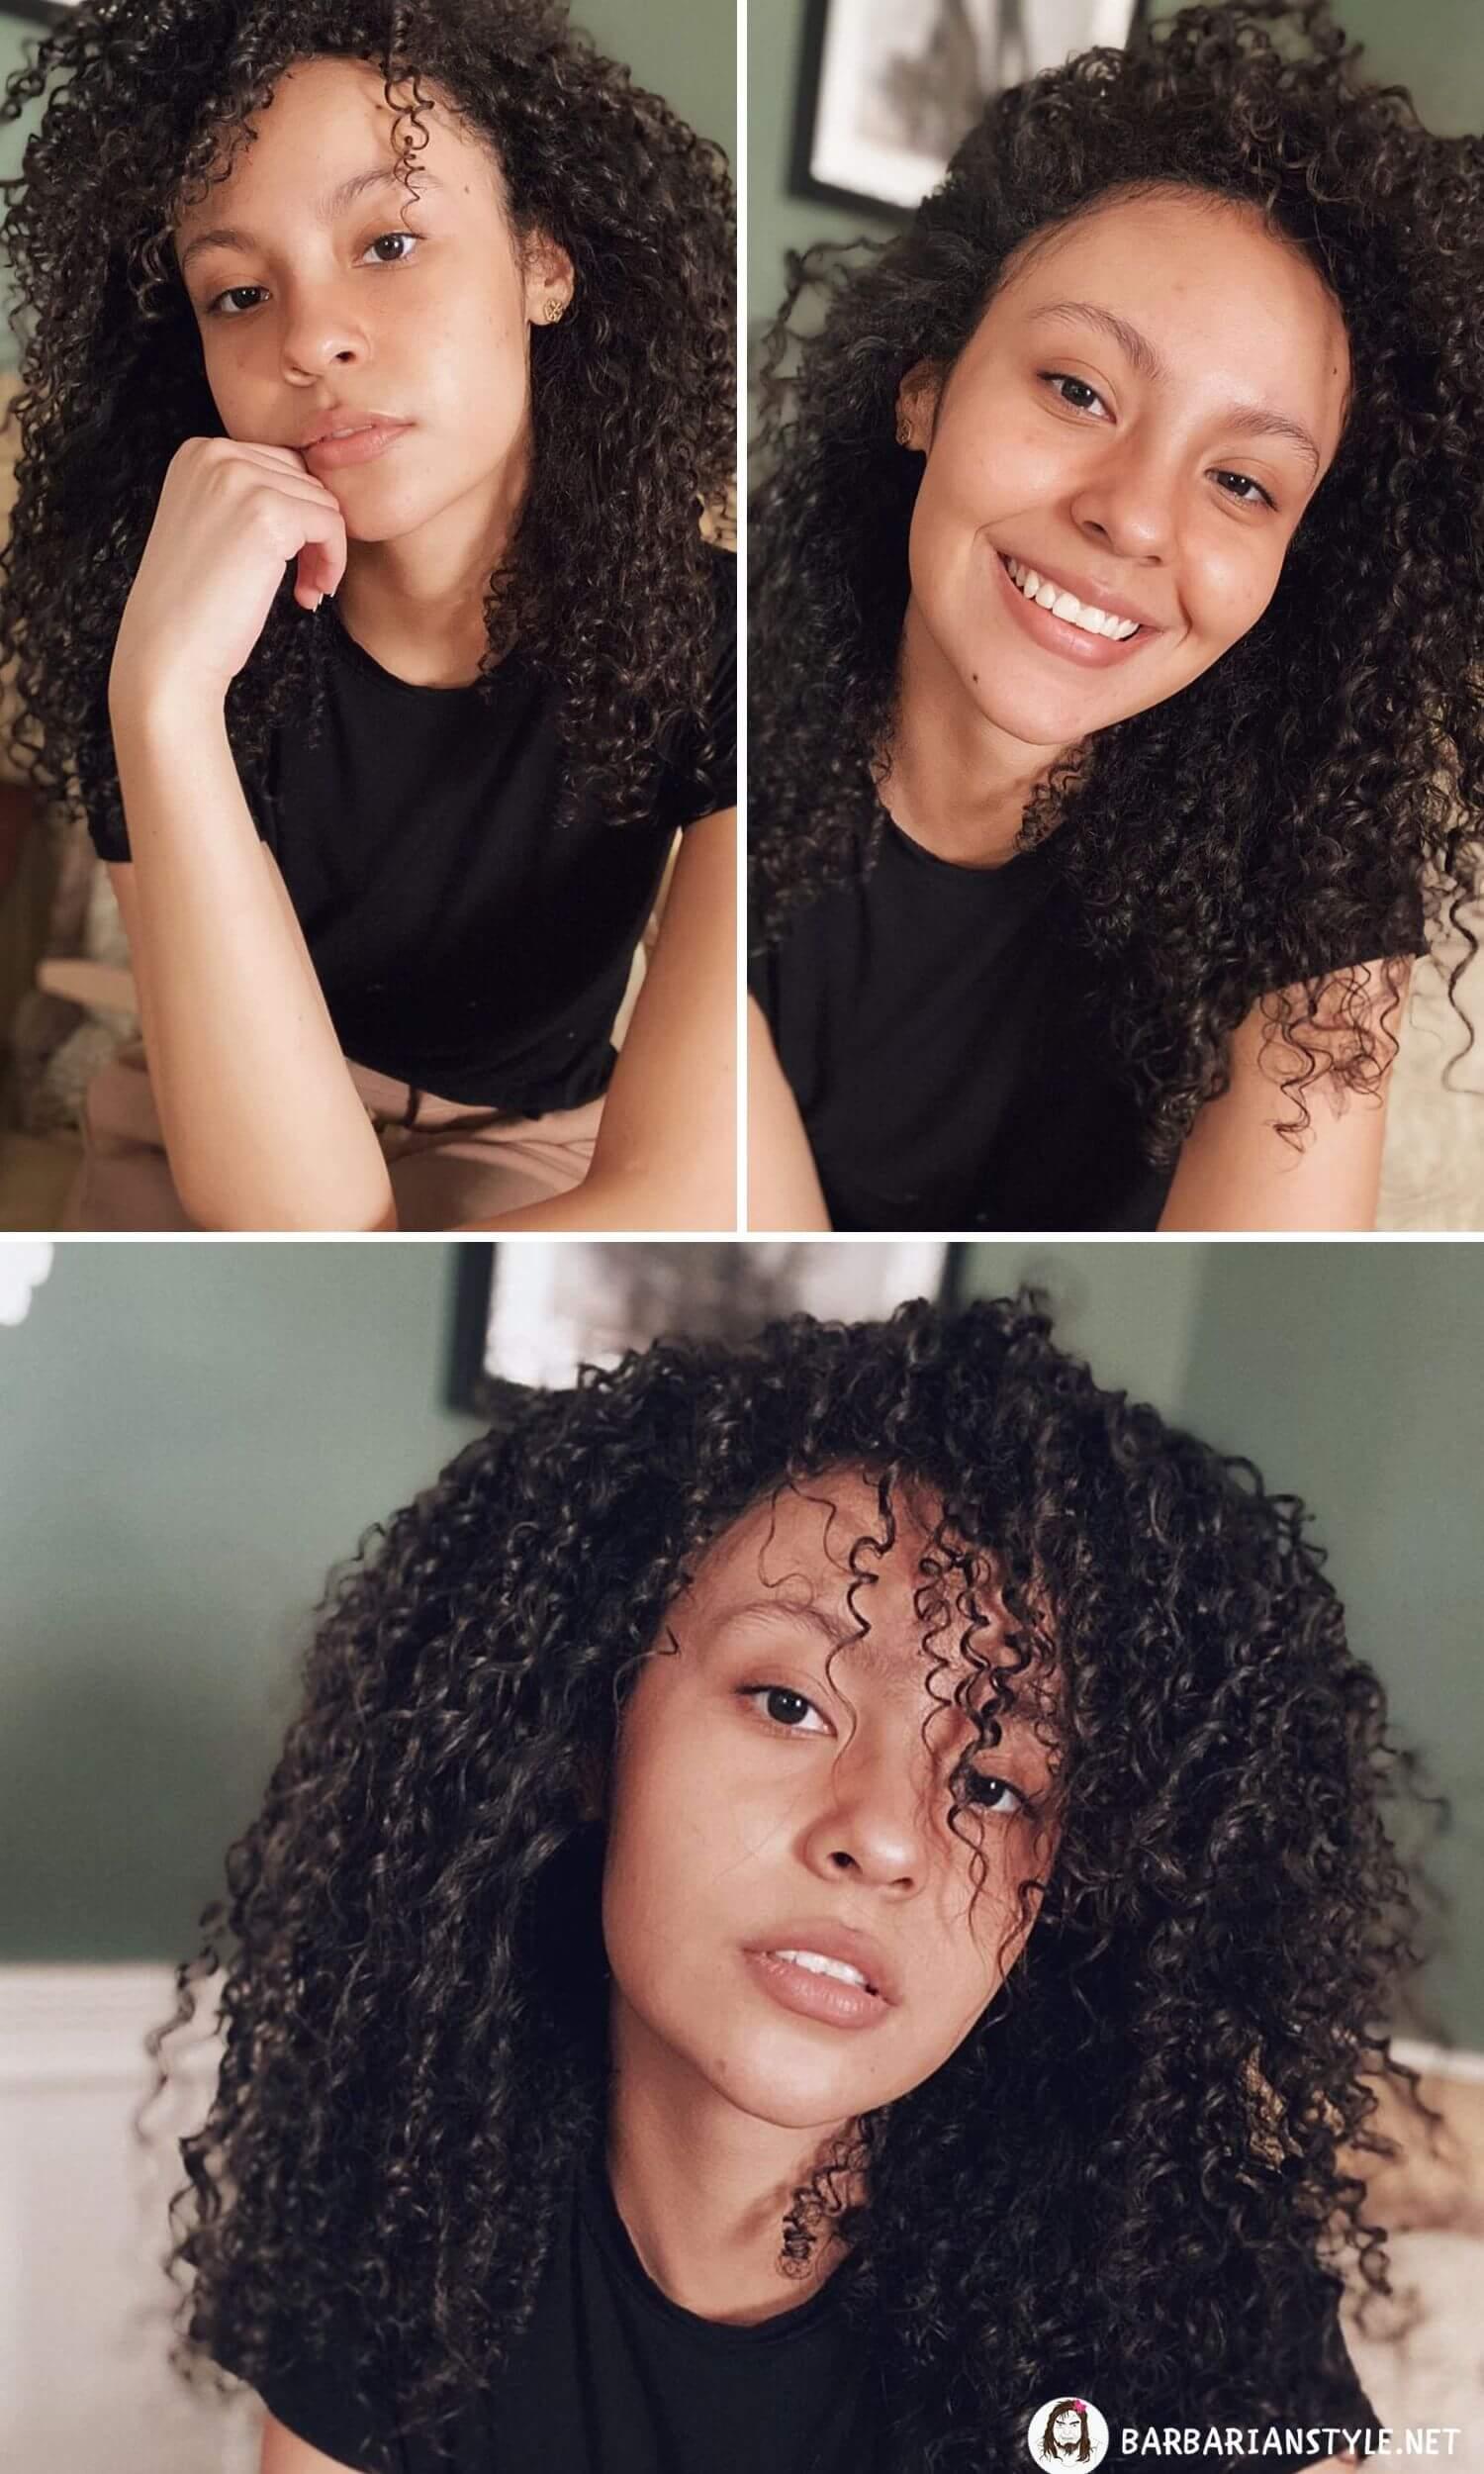 Medium-Length Black Hairstyle for Stylish Ladies